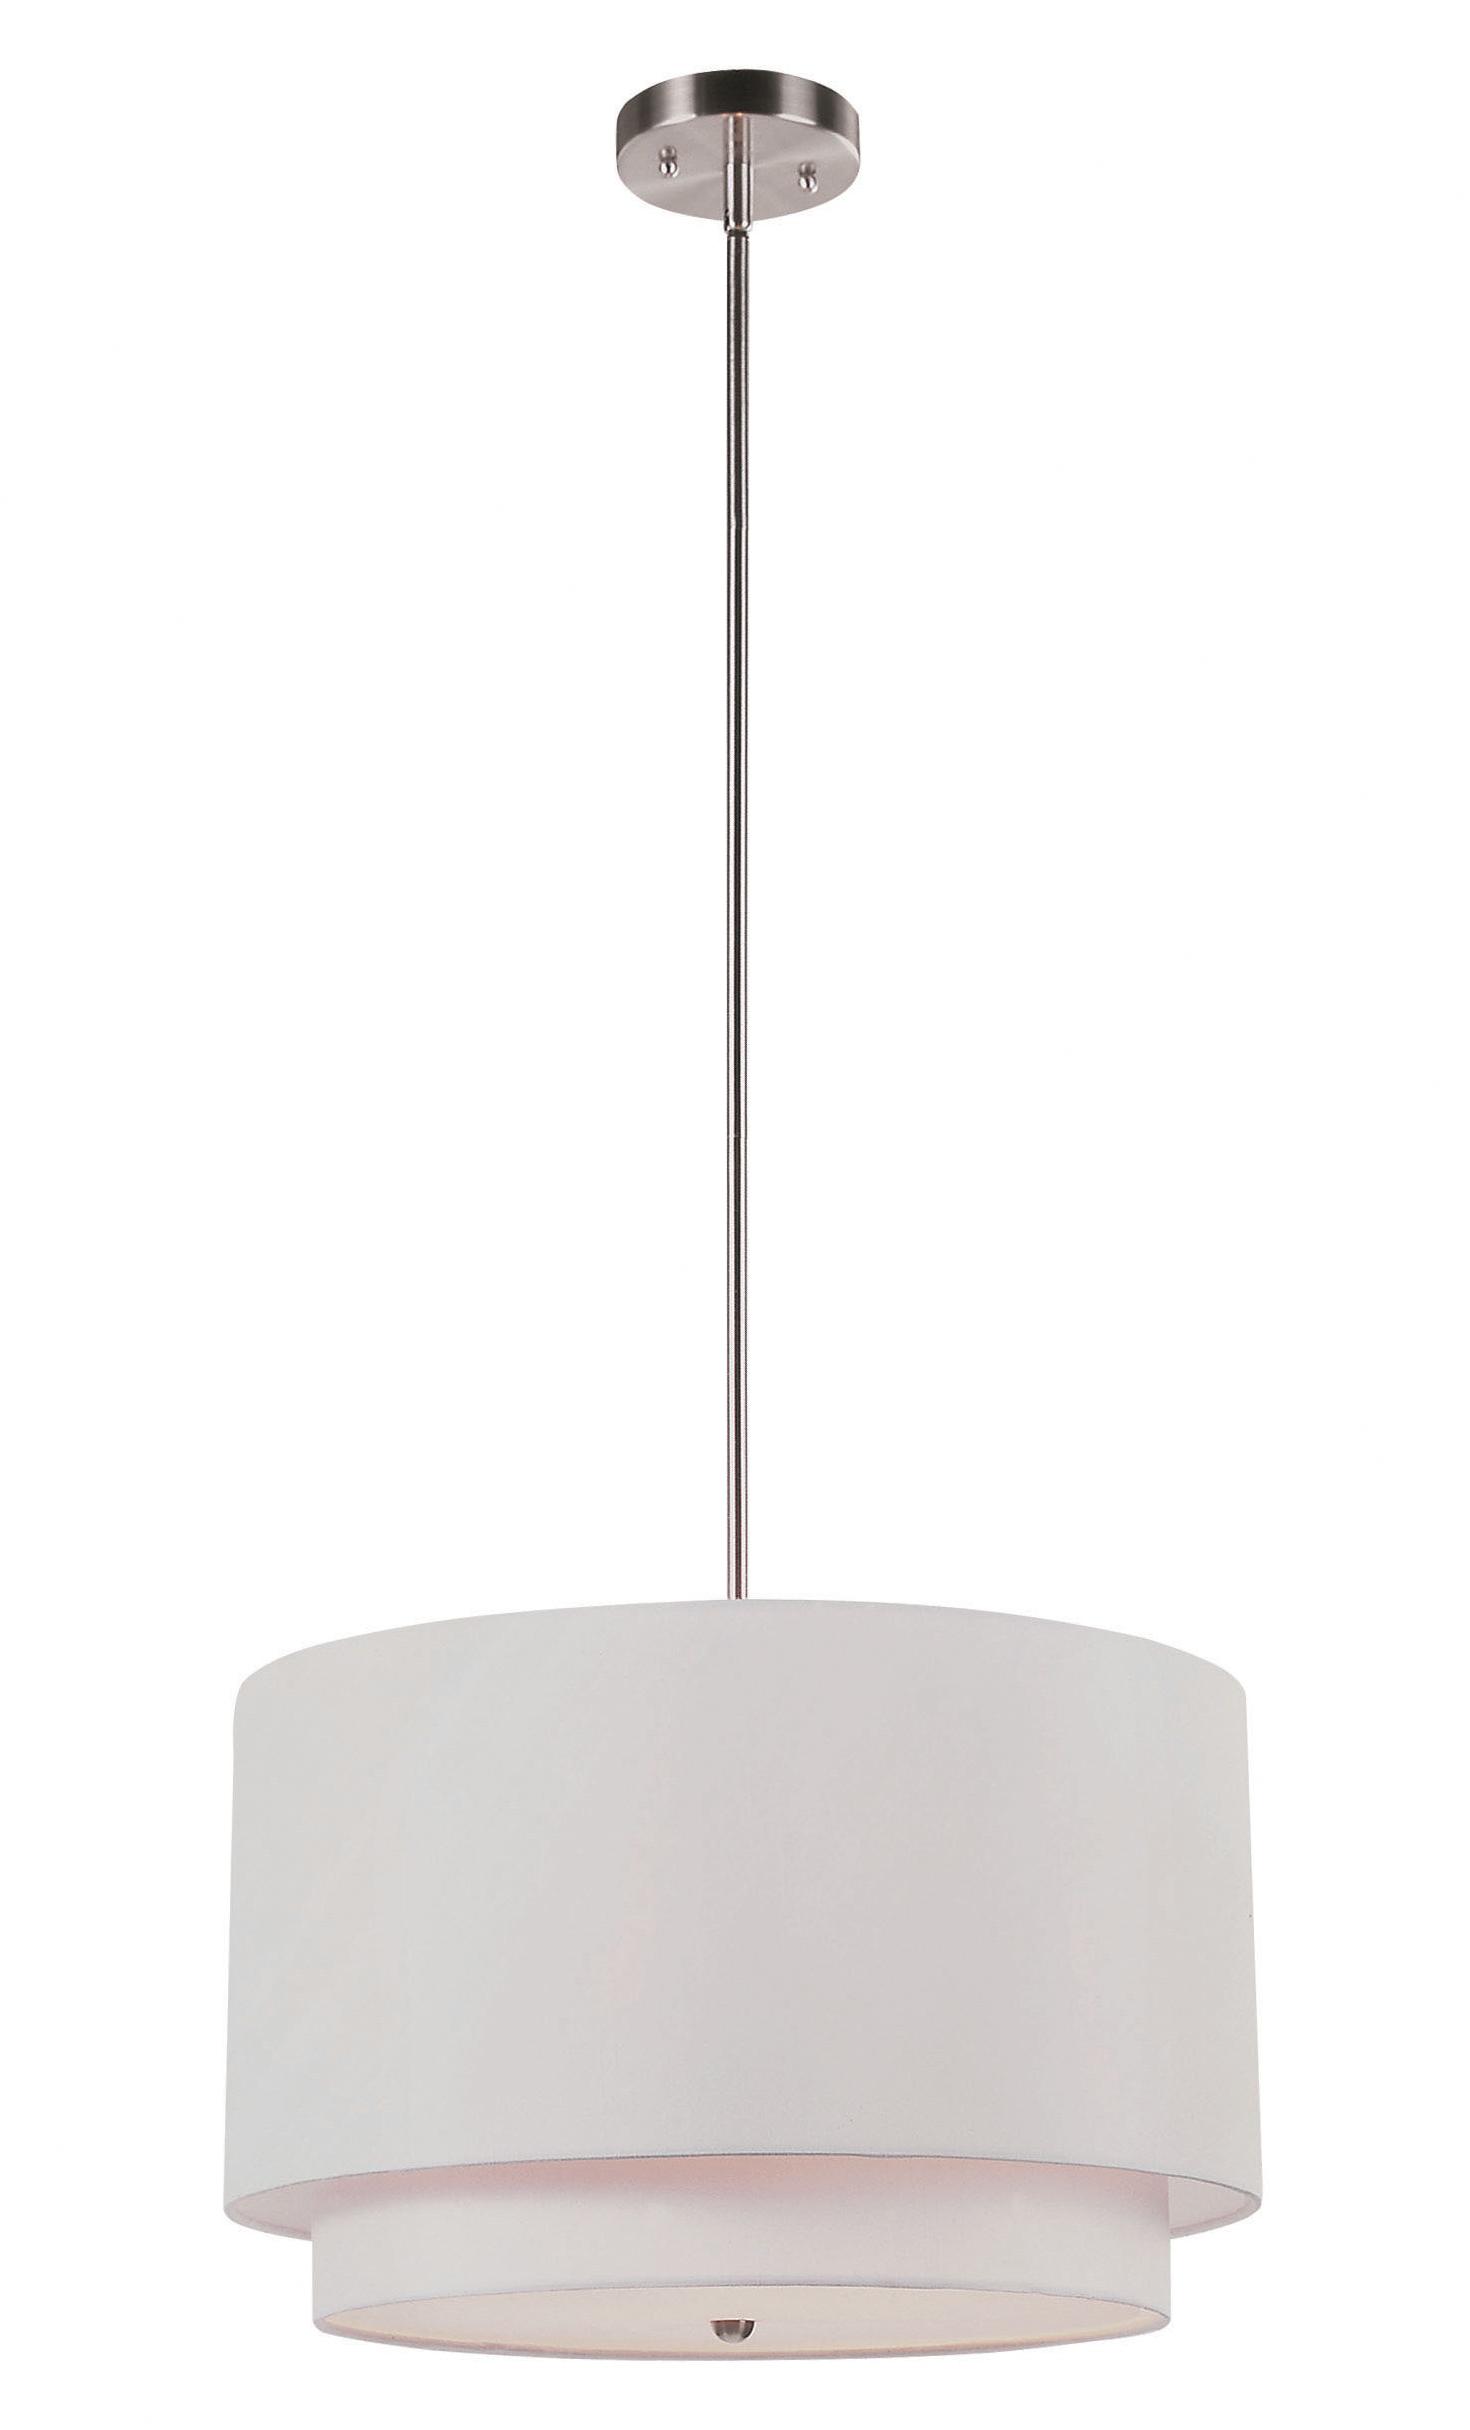 Friedland 3 Light Drum Tiered Pendant Intended For Latest Radtke 3 Light Single Drum Pendants (Gallery 4 of 20)